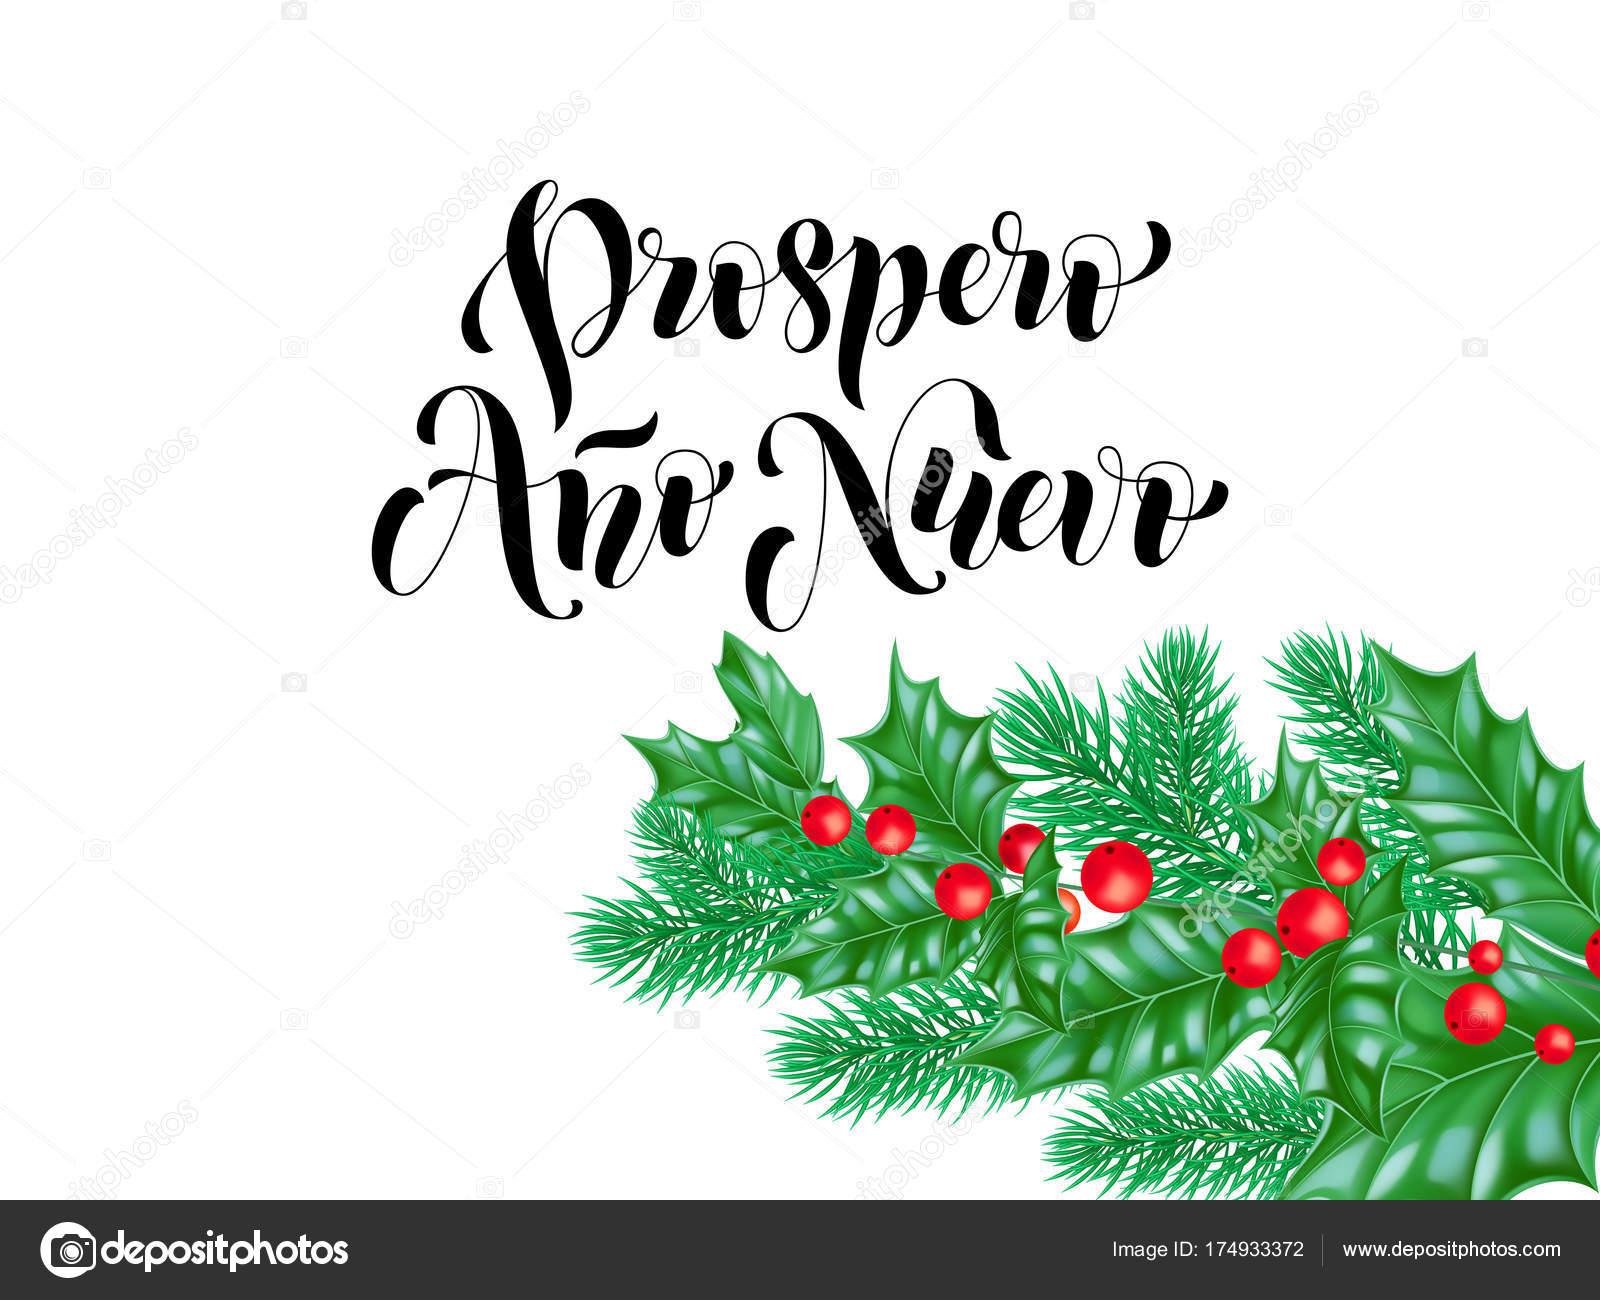 Prospero ano nuevo spanish happy new year holiday hand drawn prospero ano nuevo spanish happy new year holiday hand drawn calligraphy lettering greeting card background template m4hsunfo